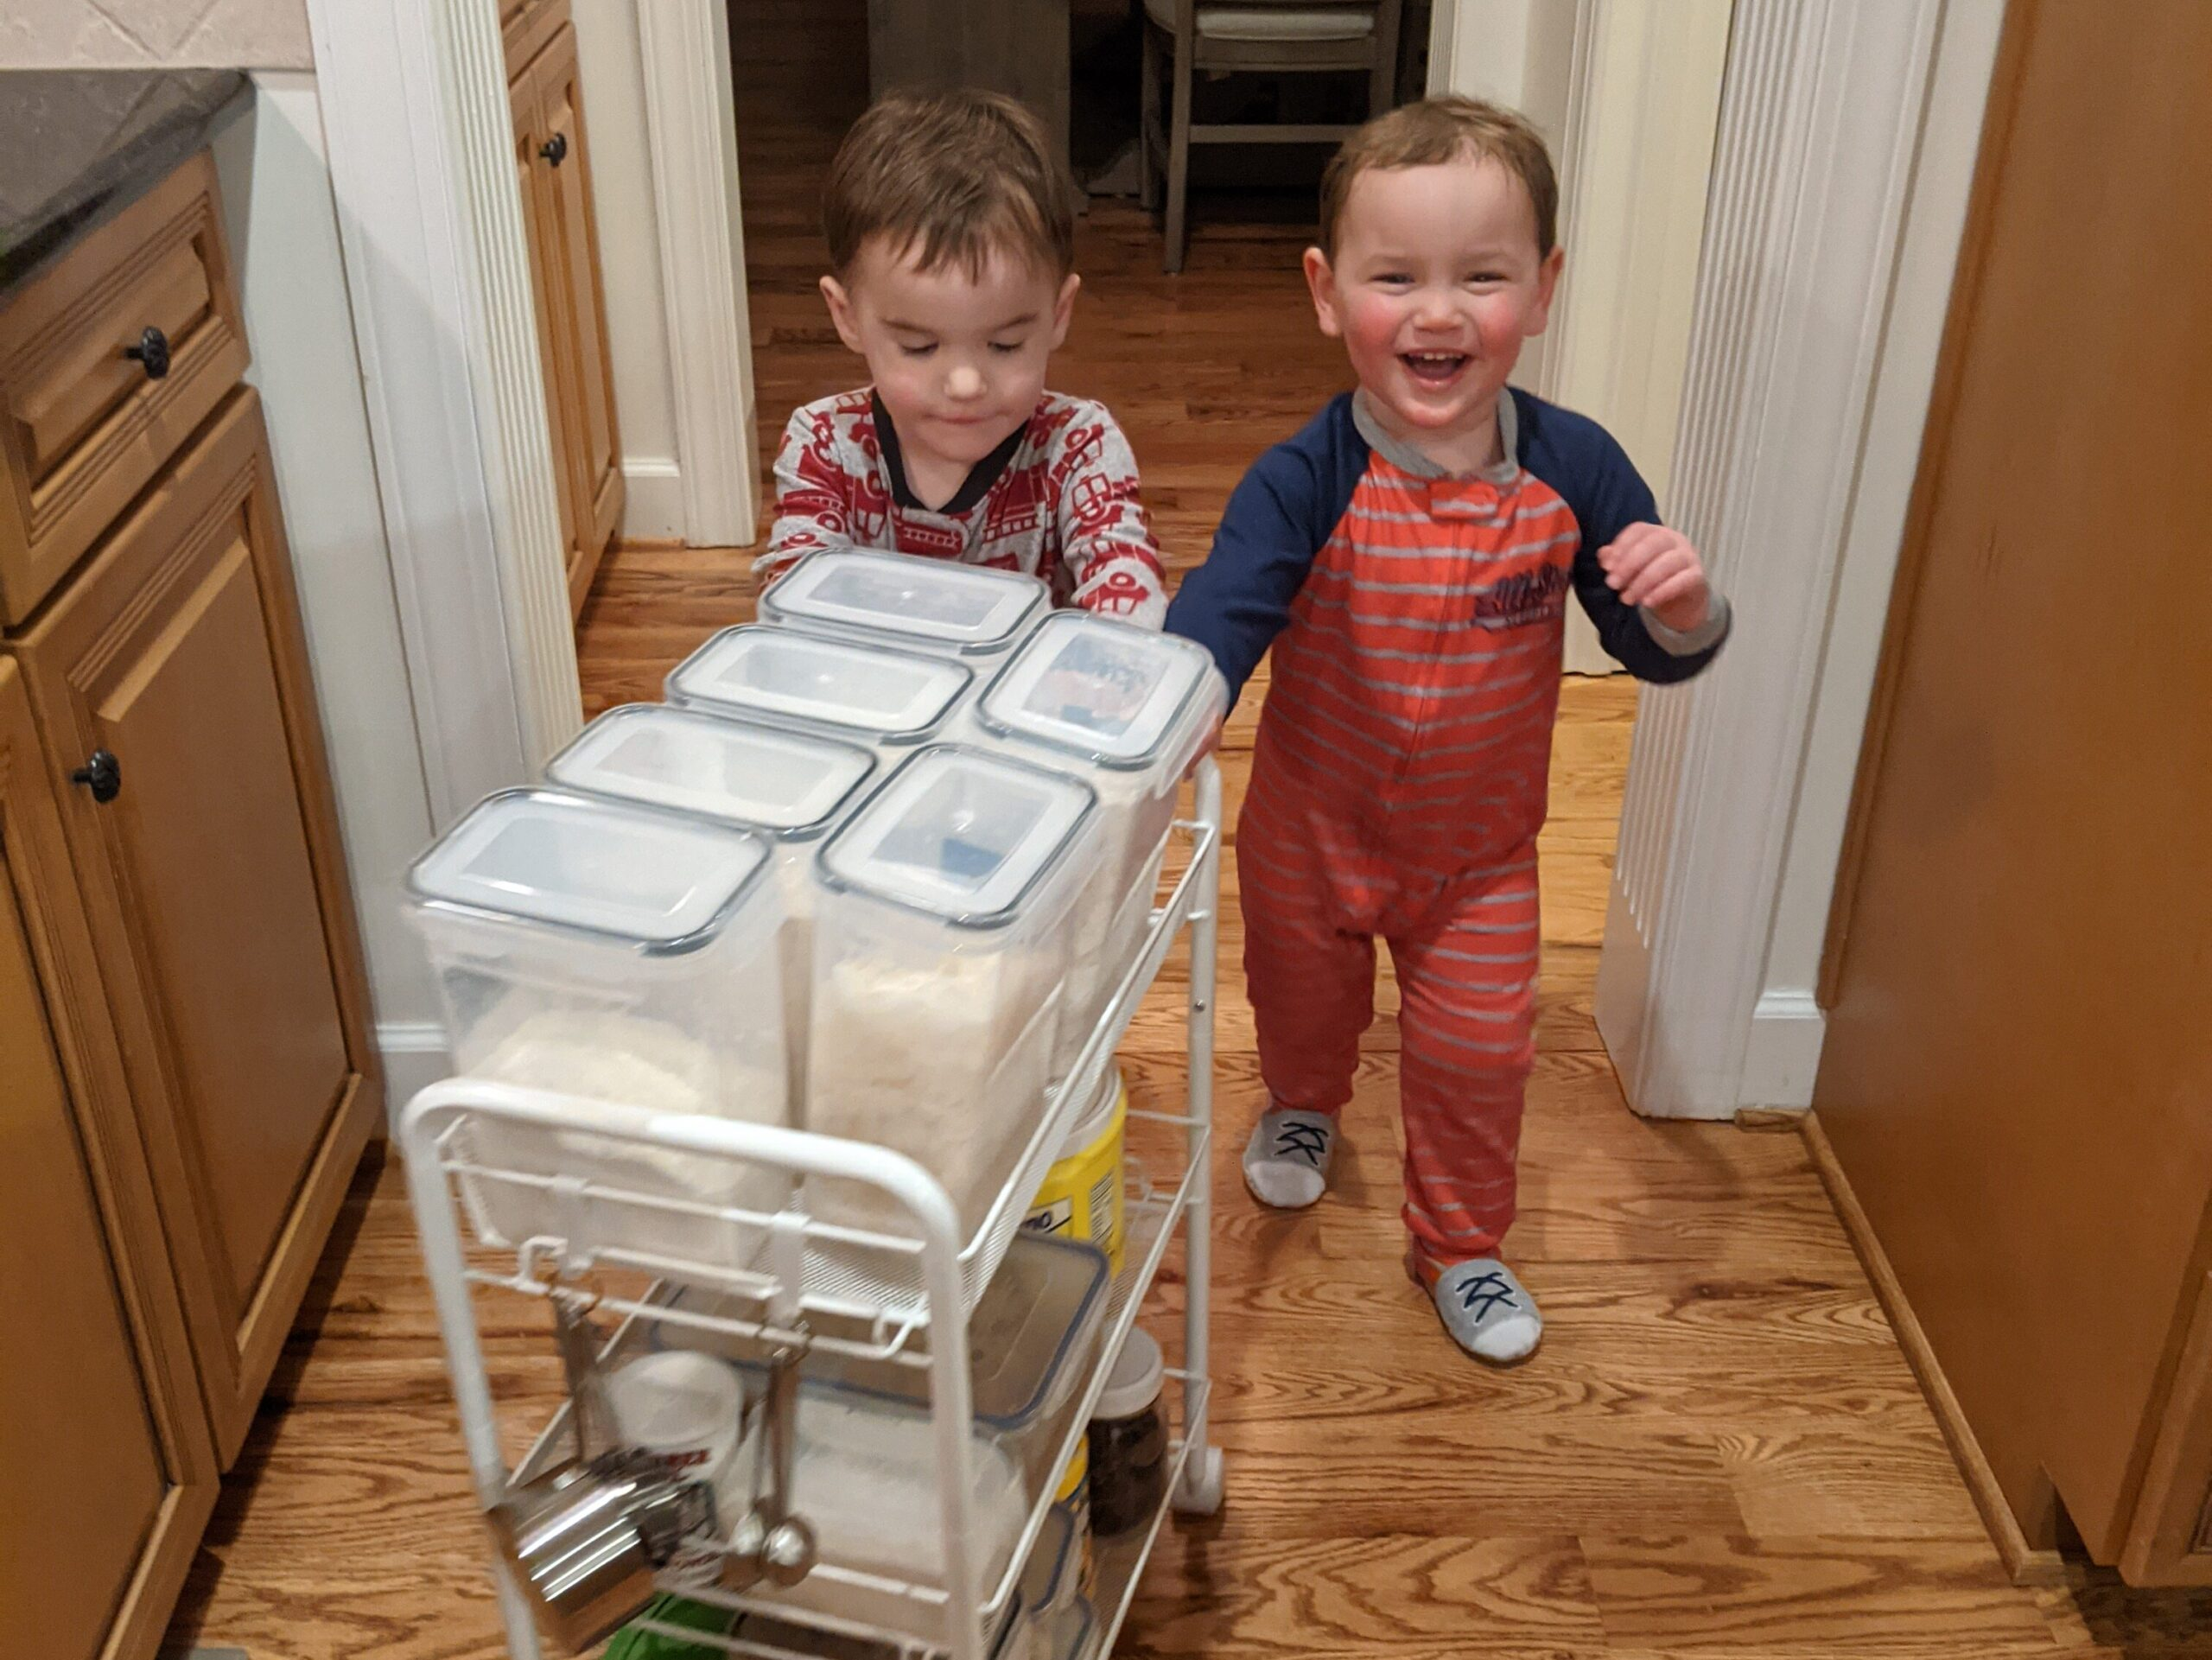 Twin toddlers pushing an organized cart of baking supplies